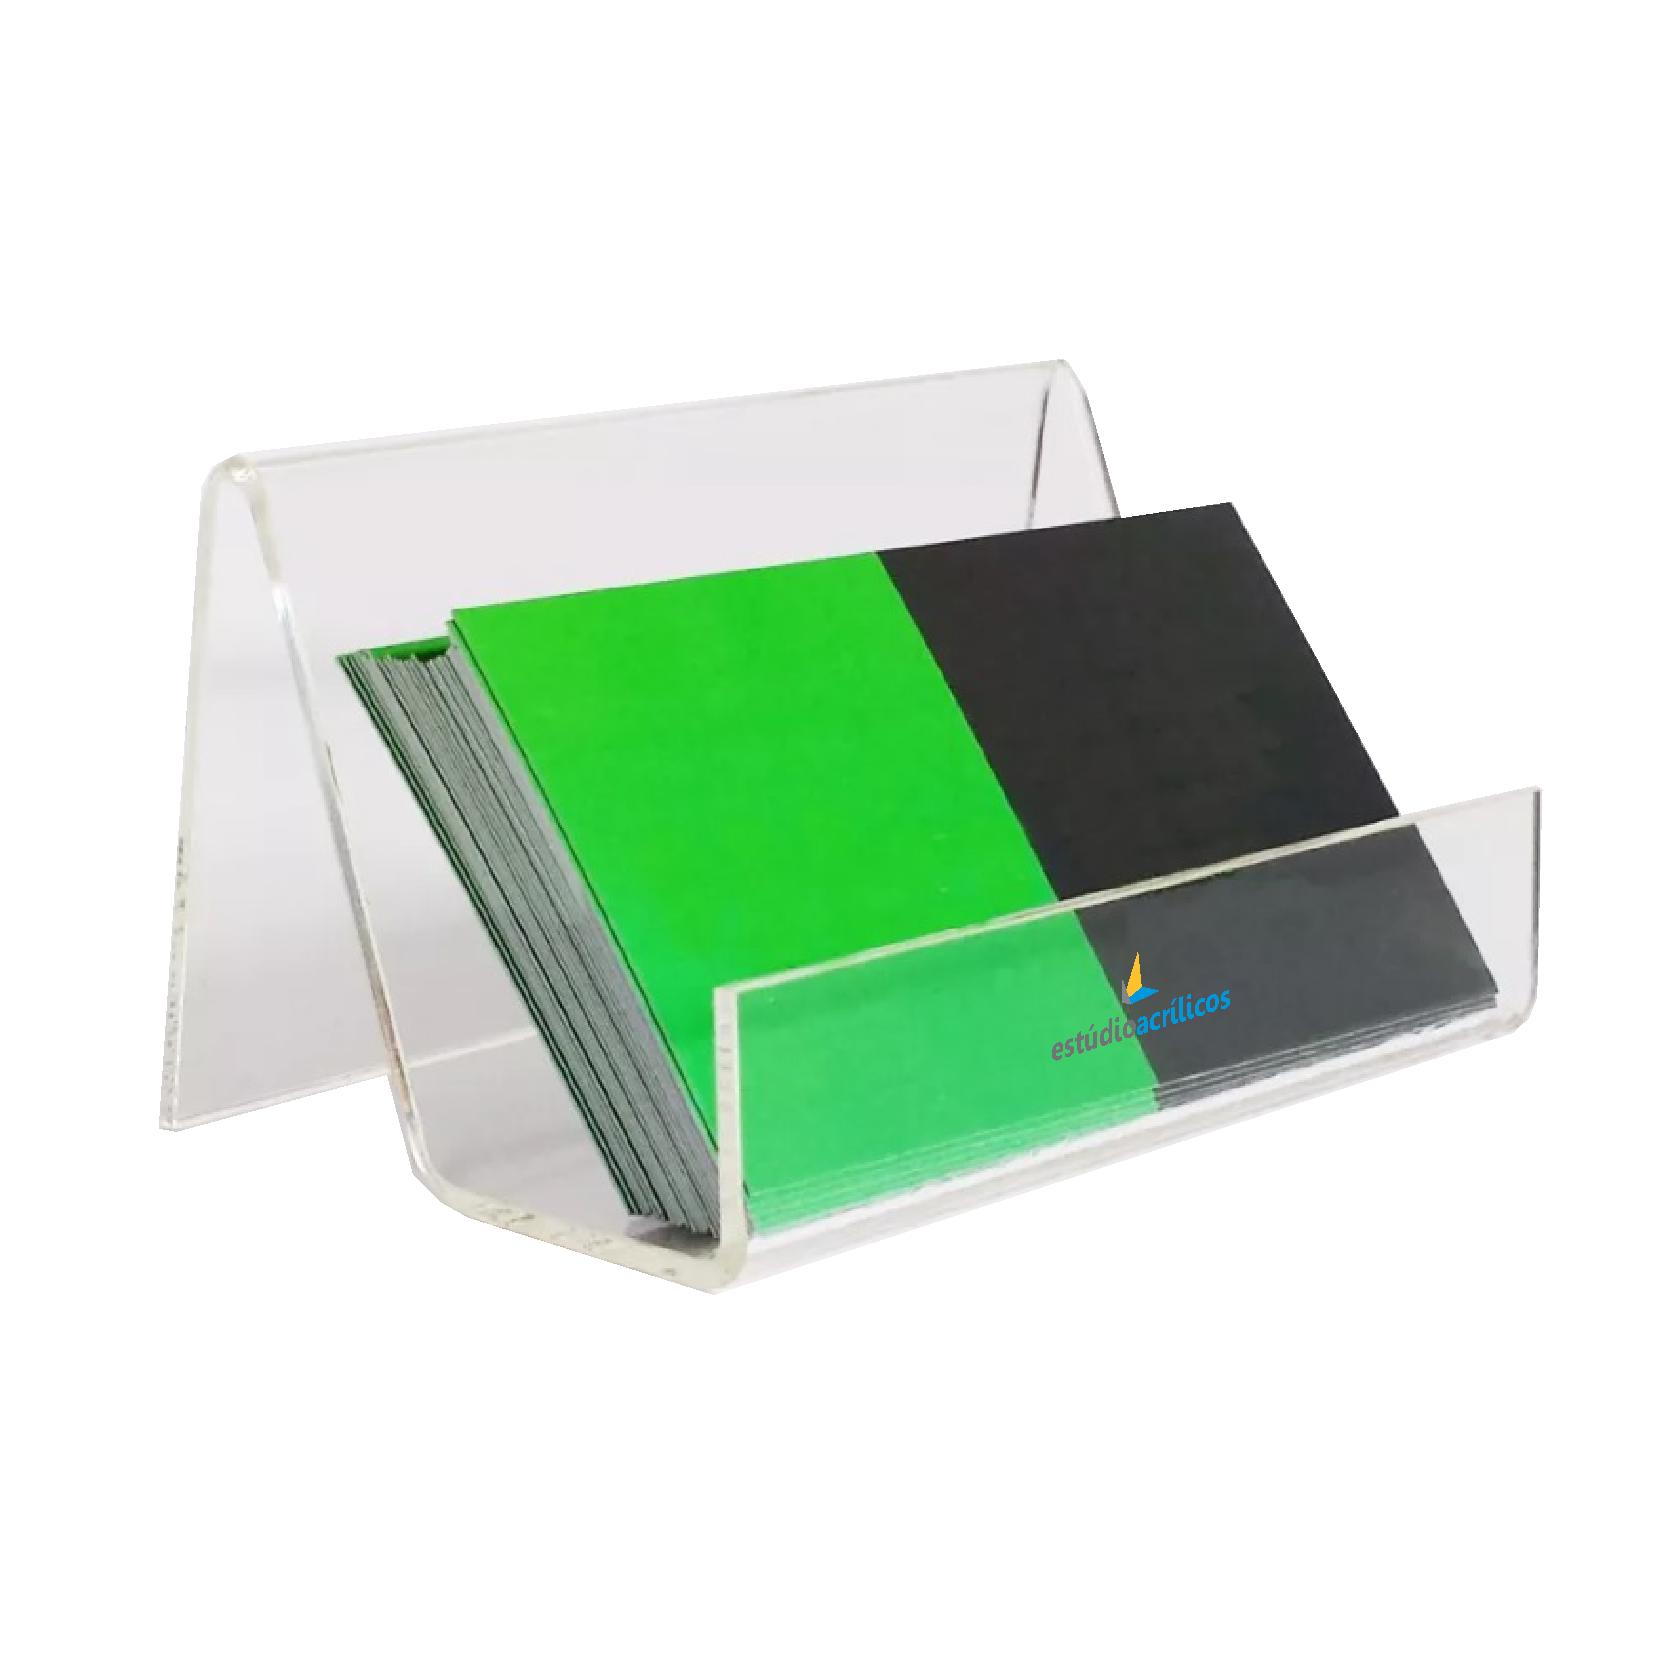 Porta Cartão De Visitas De Mesa Acrílico Cristal - Clean